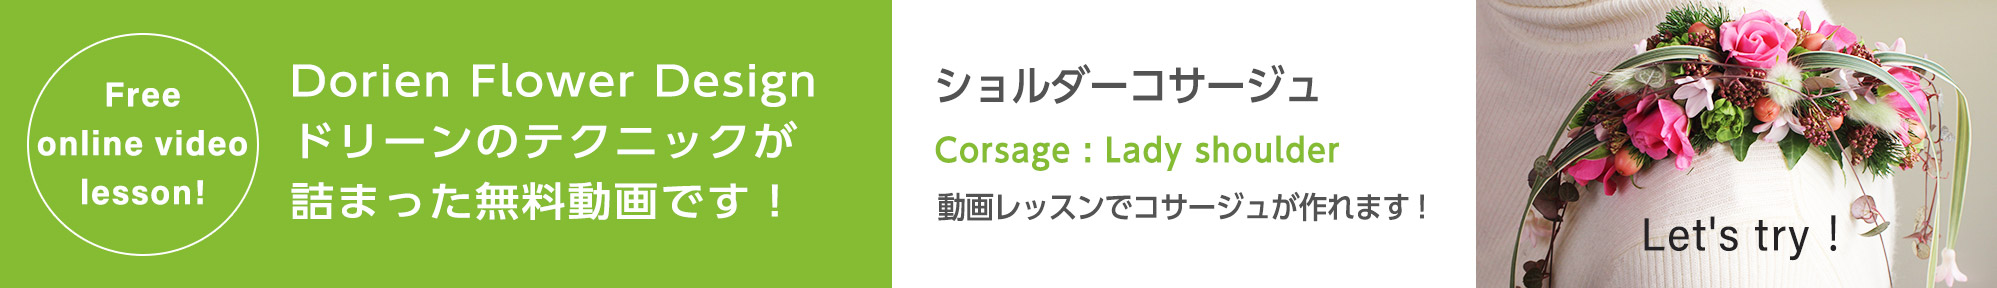 Free  online video  lesson! Dorien Flower Design ドリーンのテクニックが詰まった無料動画です!  ショルダーコサージュ Corsage Lady shoulder 動画レッスンでコサージュが作れます!